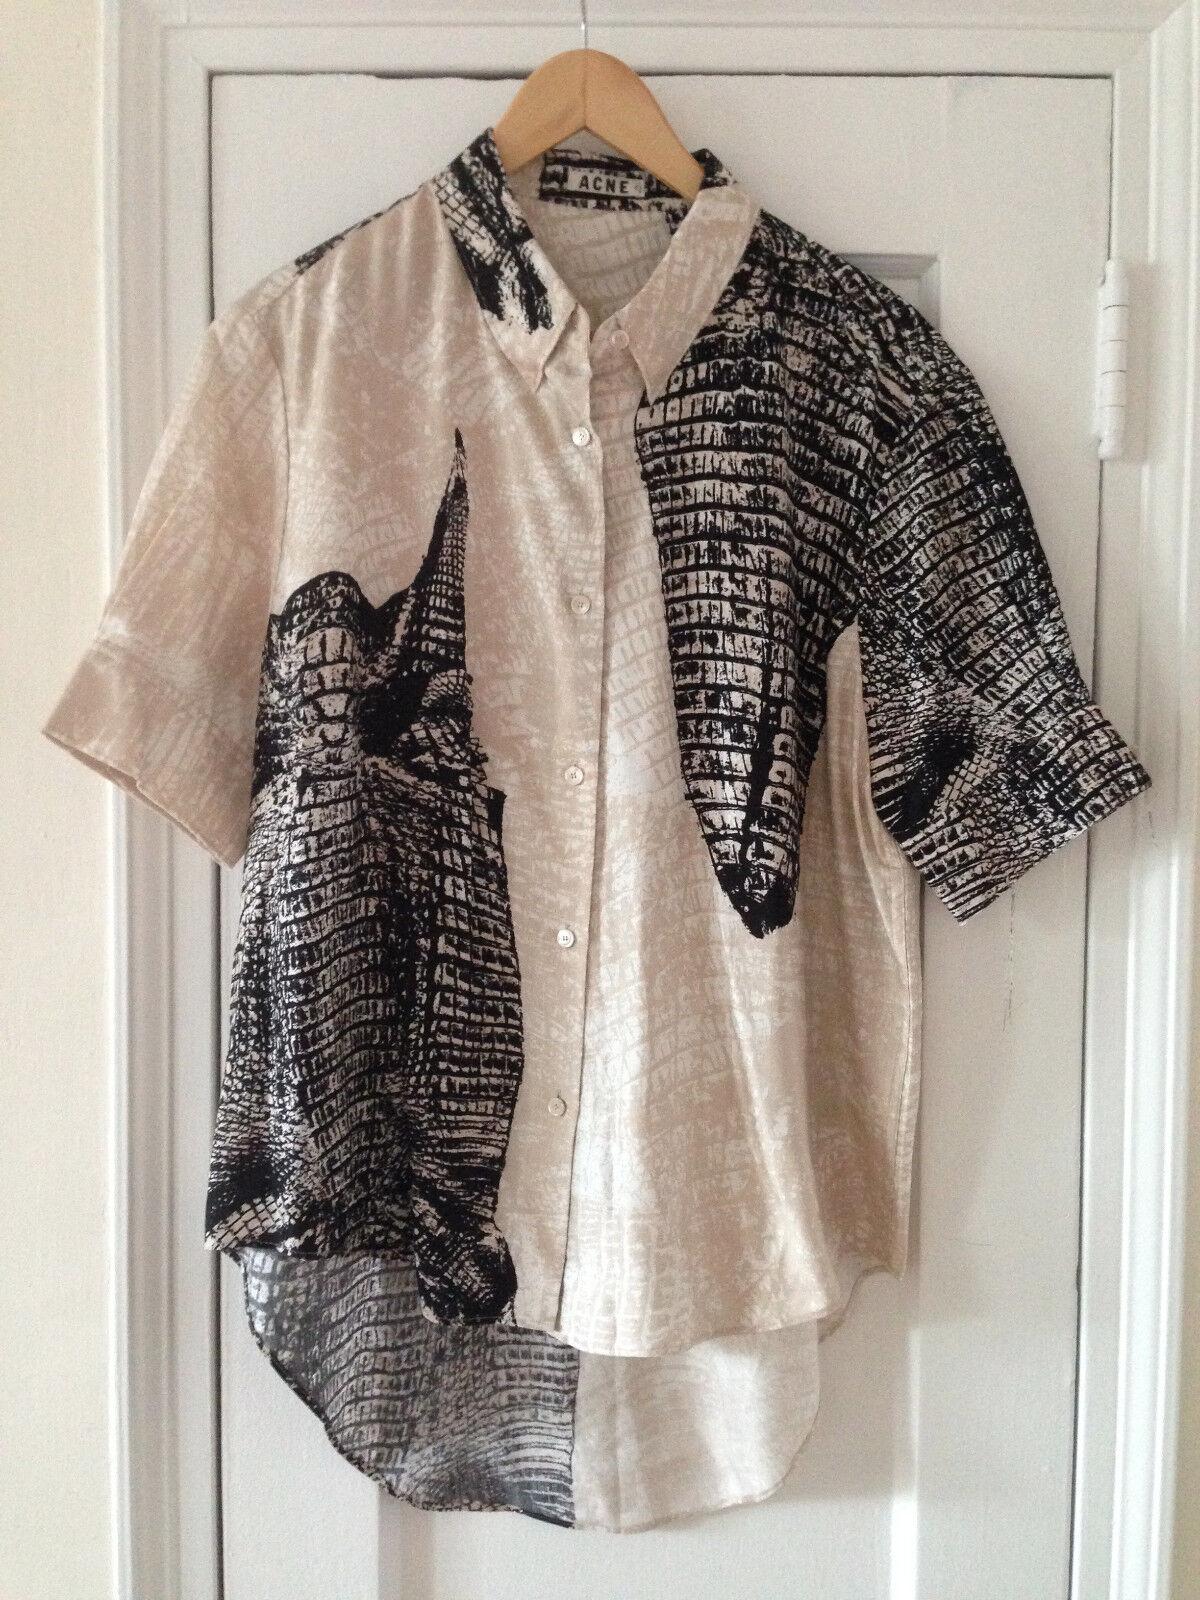 Acne Studios Patia Kroko schwarz   Beige Shirt, SS13, Never worn, Größe 40